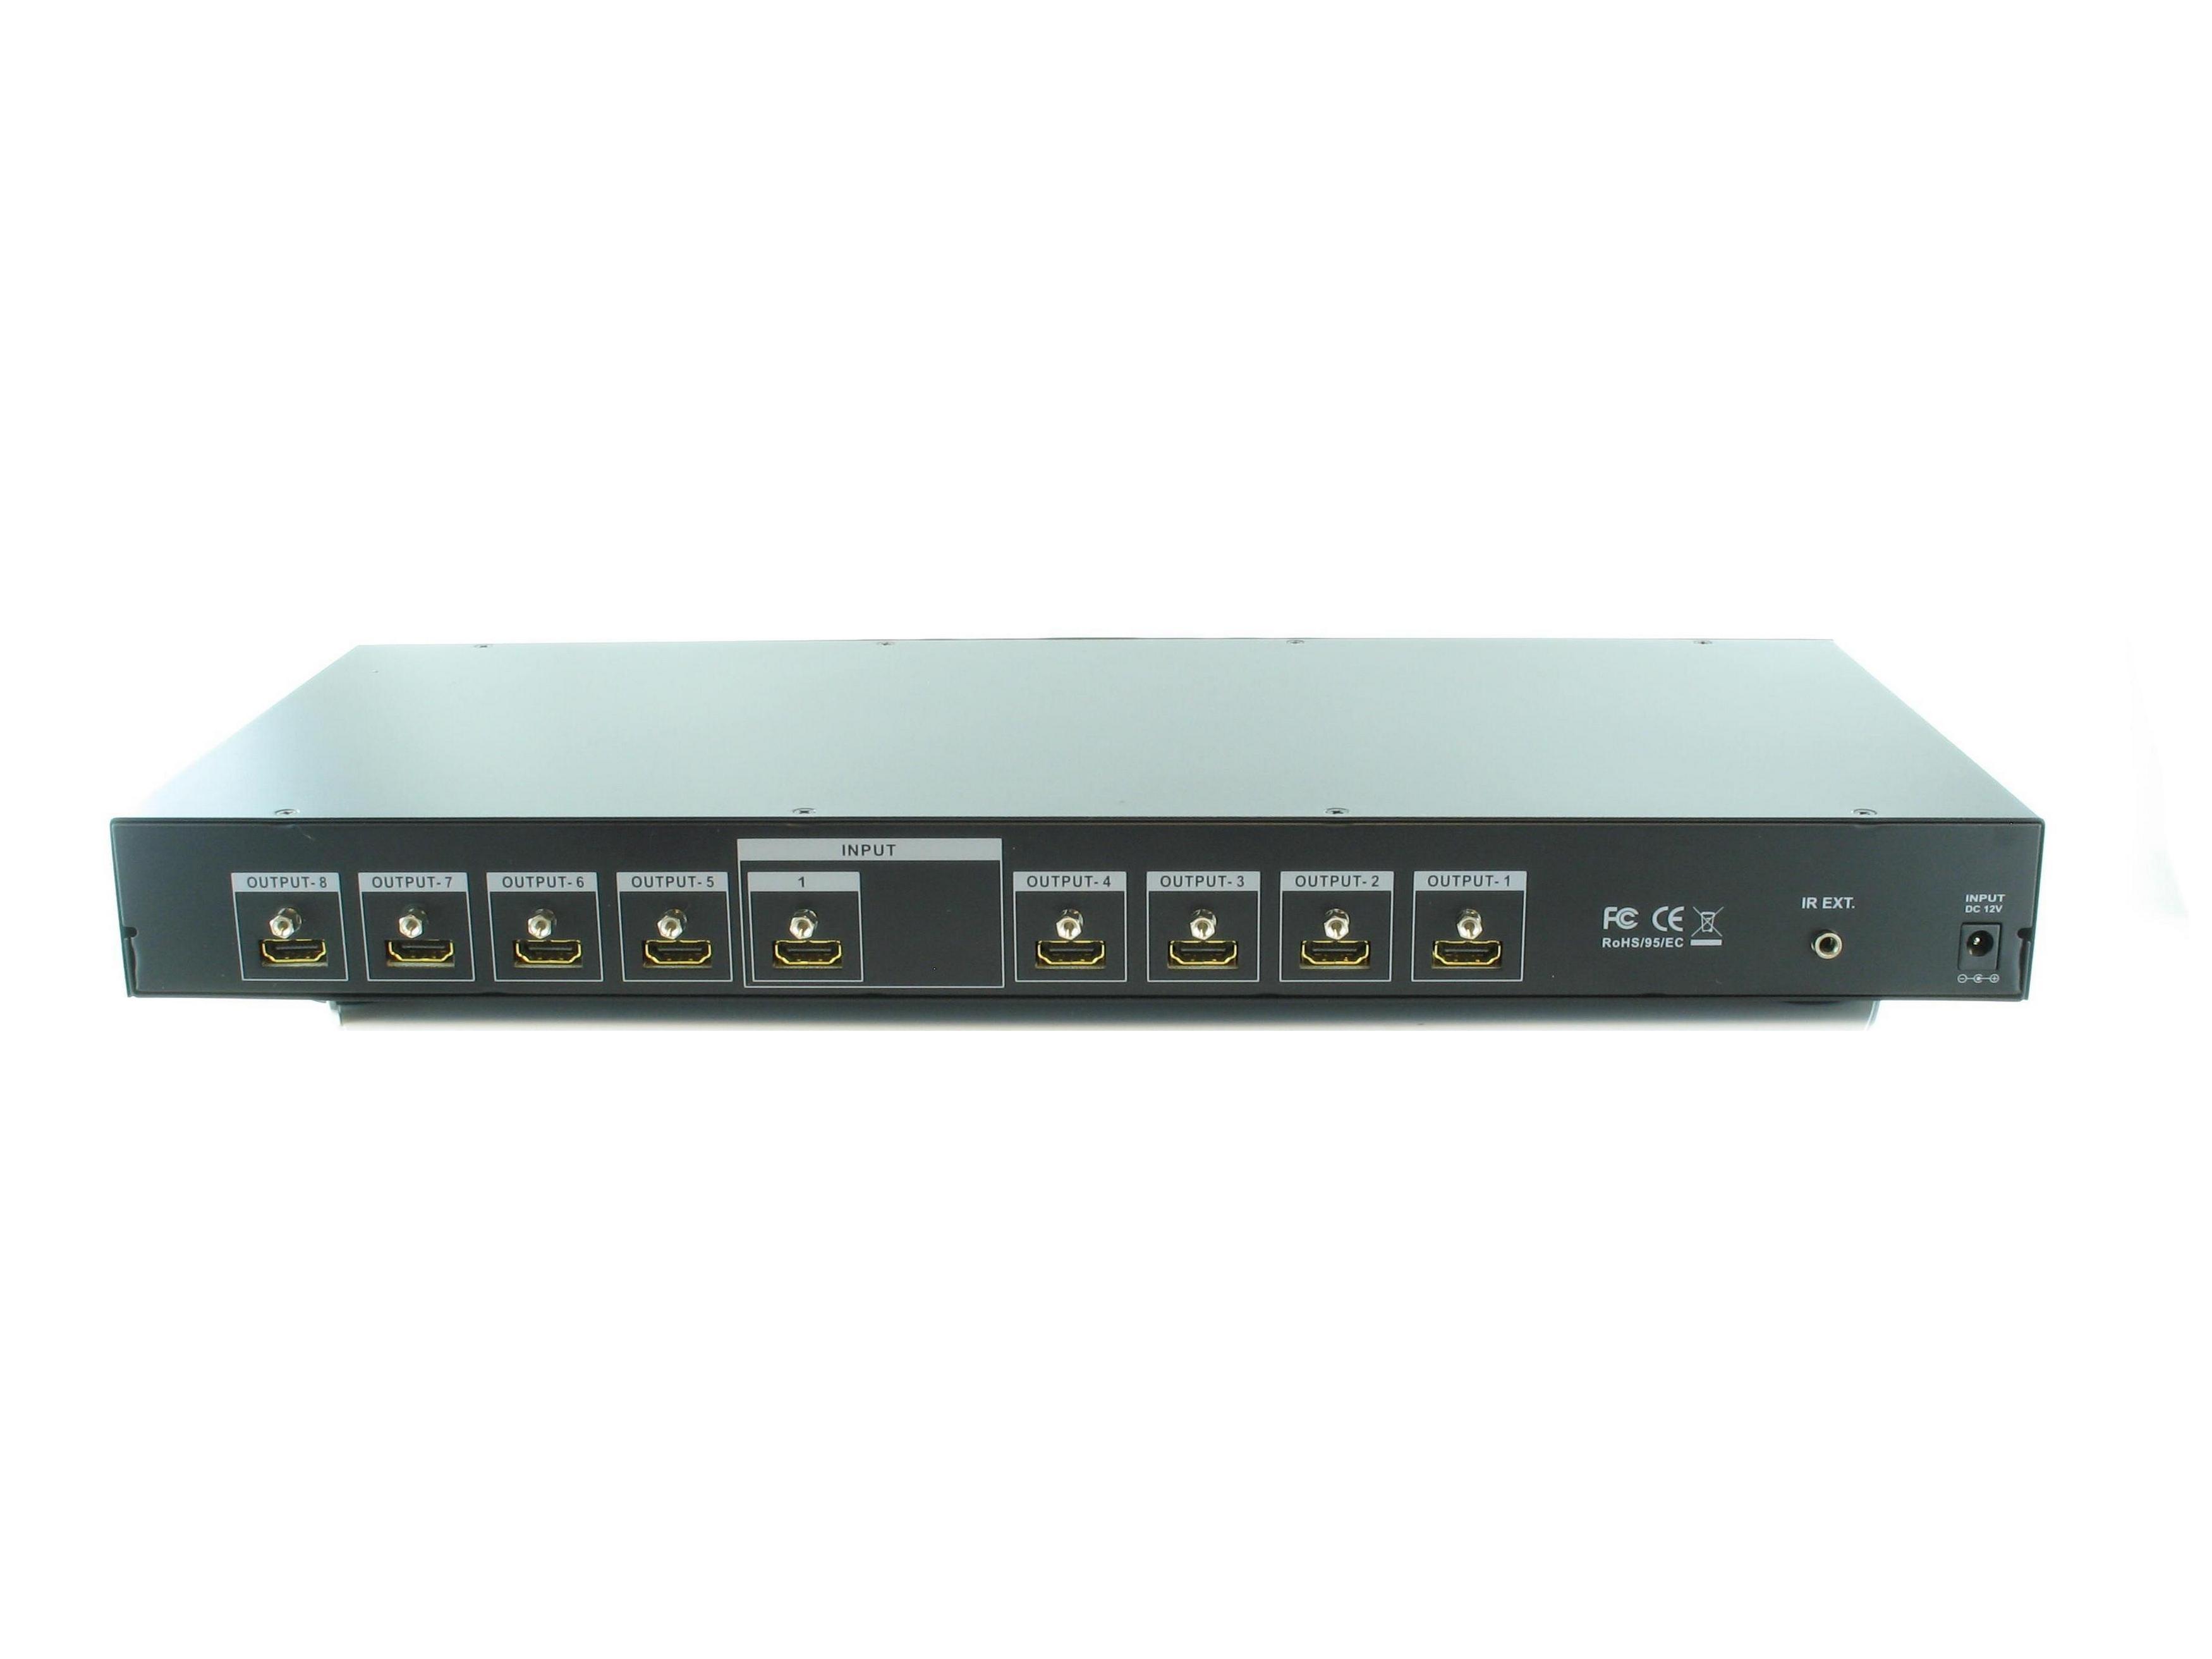 SB-5658 1:8 HDMI Distribution Amplifier V1.3b by Shinybow